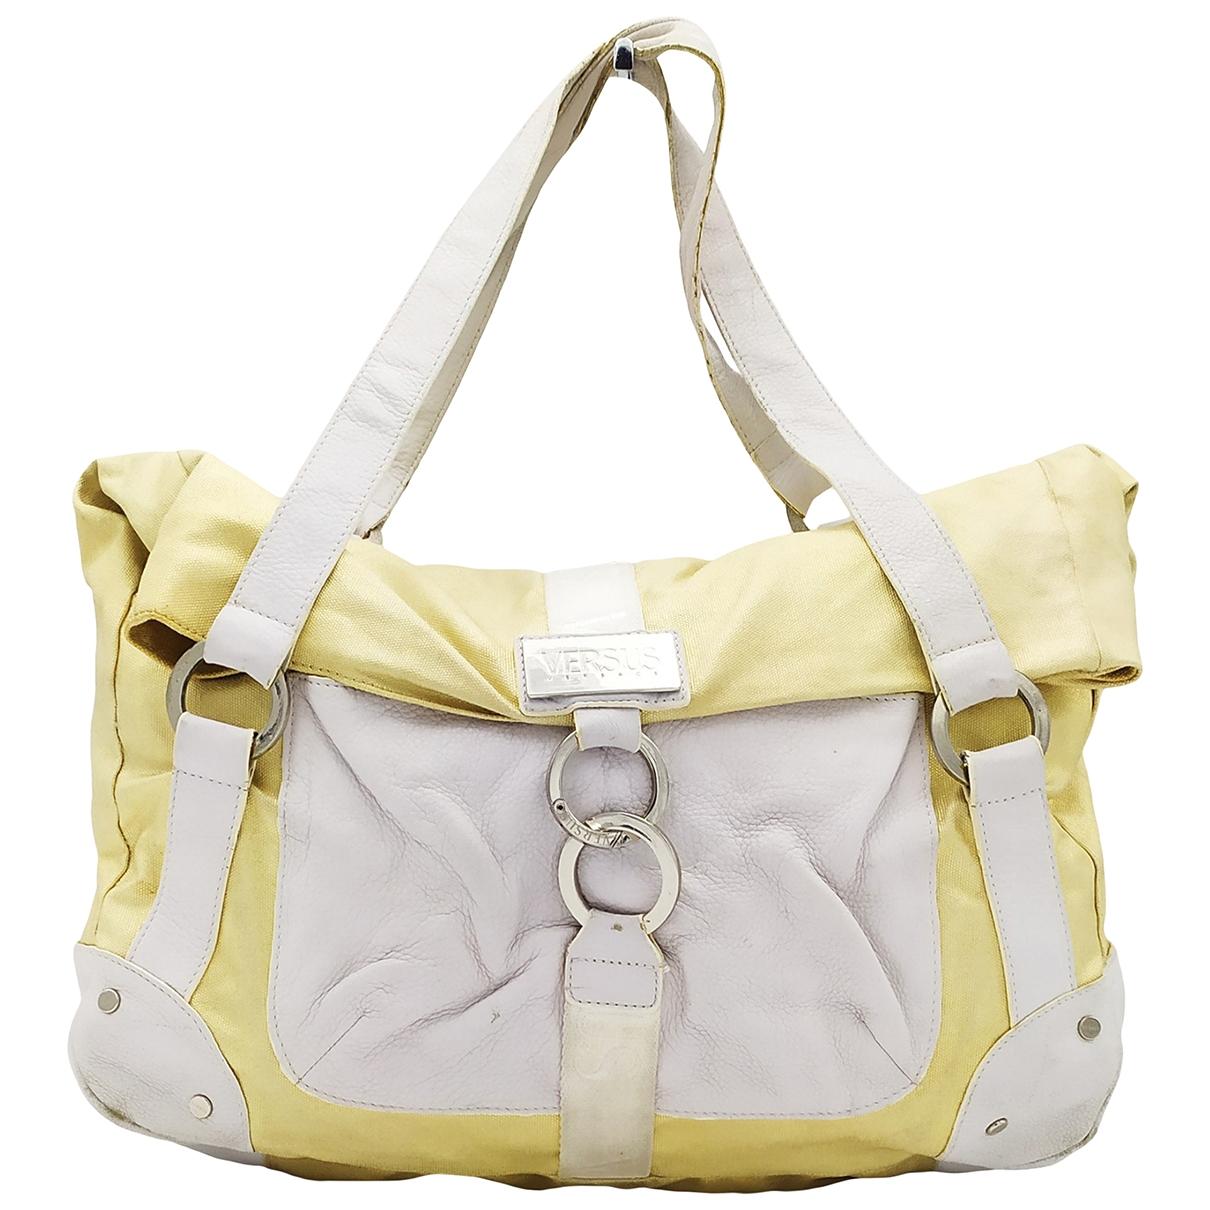 Versus \N Handtasche in  Gold Leinen